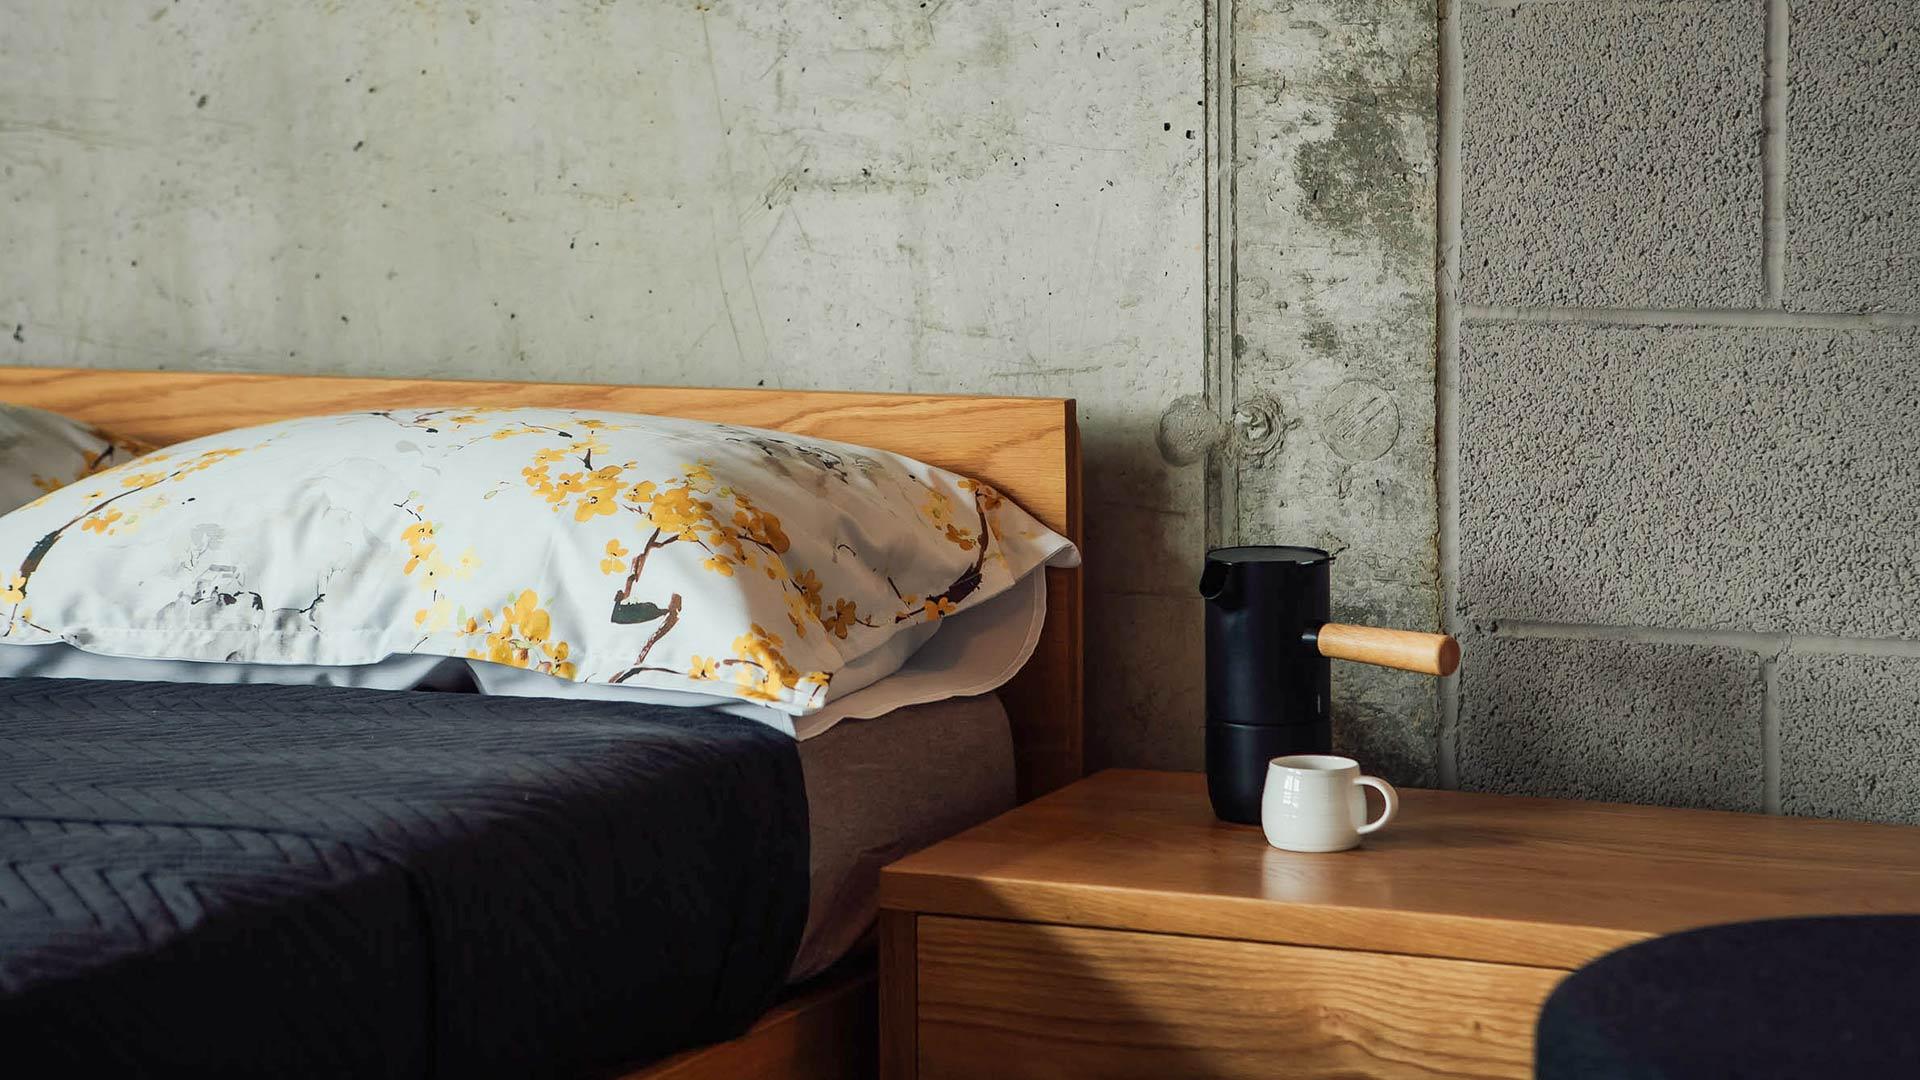 blossom-ochre-pillowcase-detail